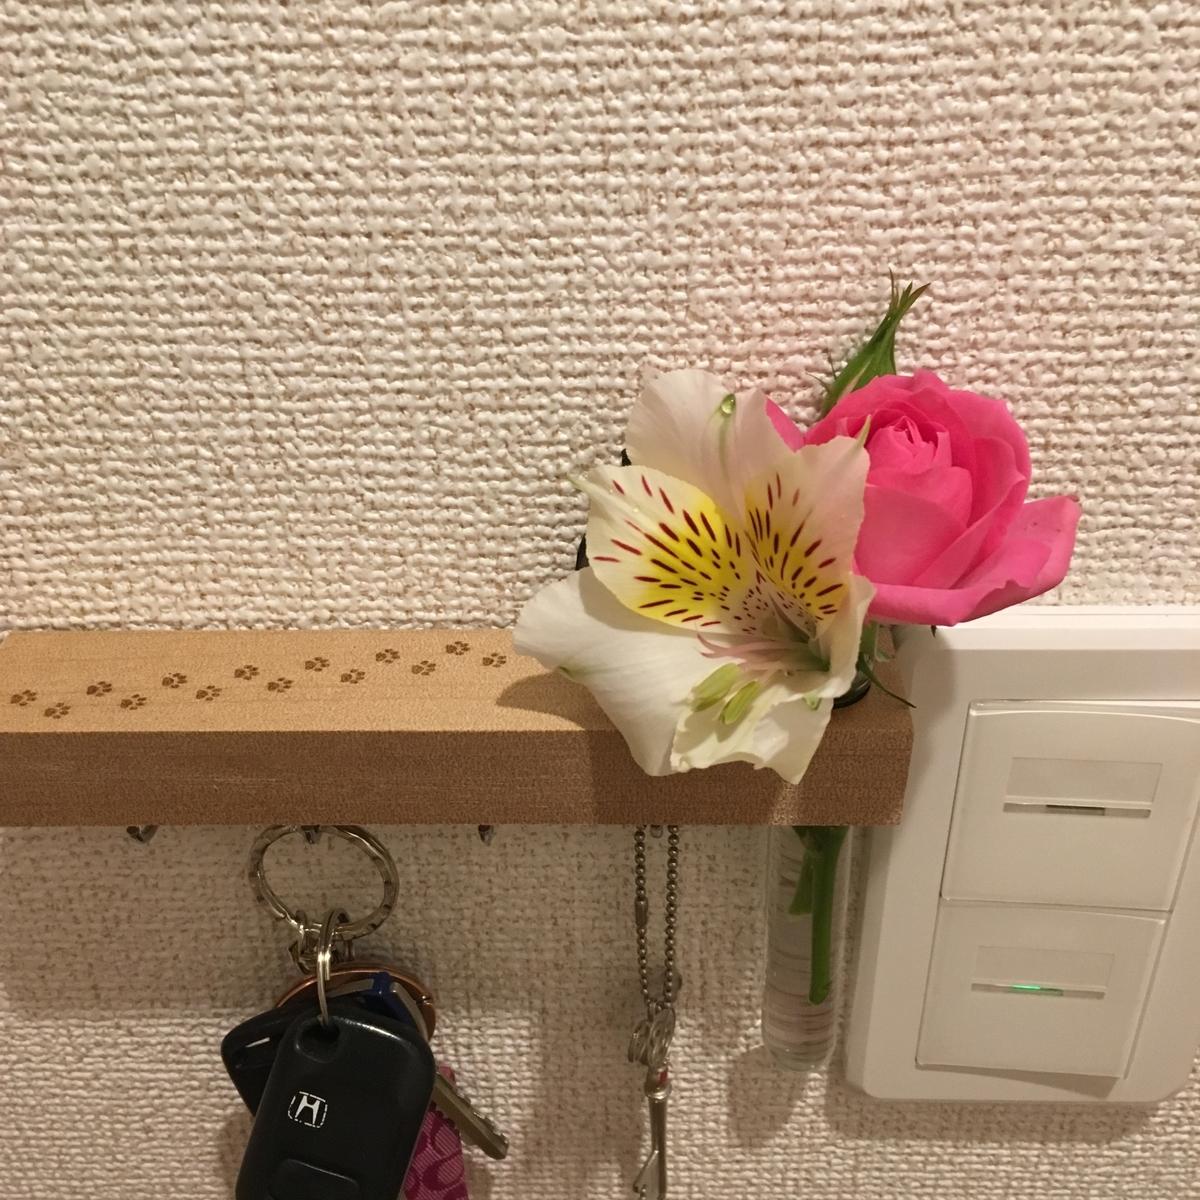 f:id:amane-yuuna:20190503195940j:plain